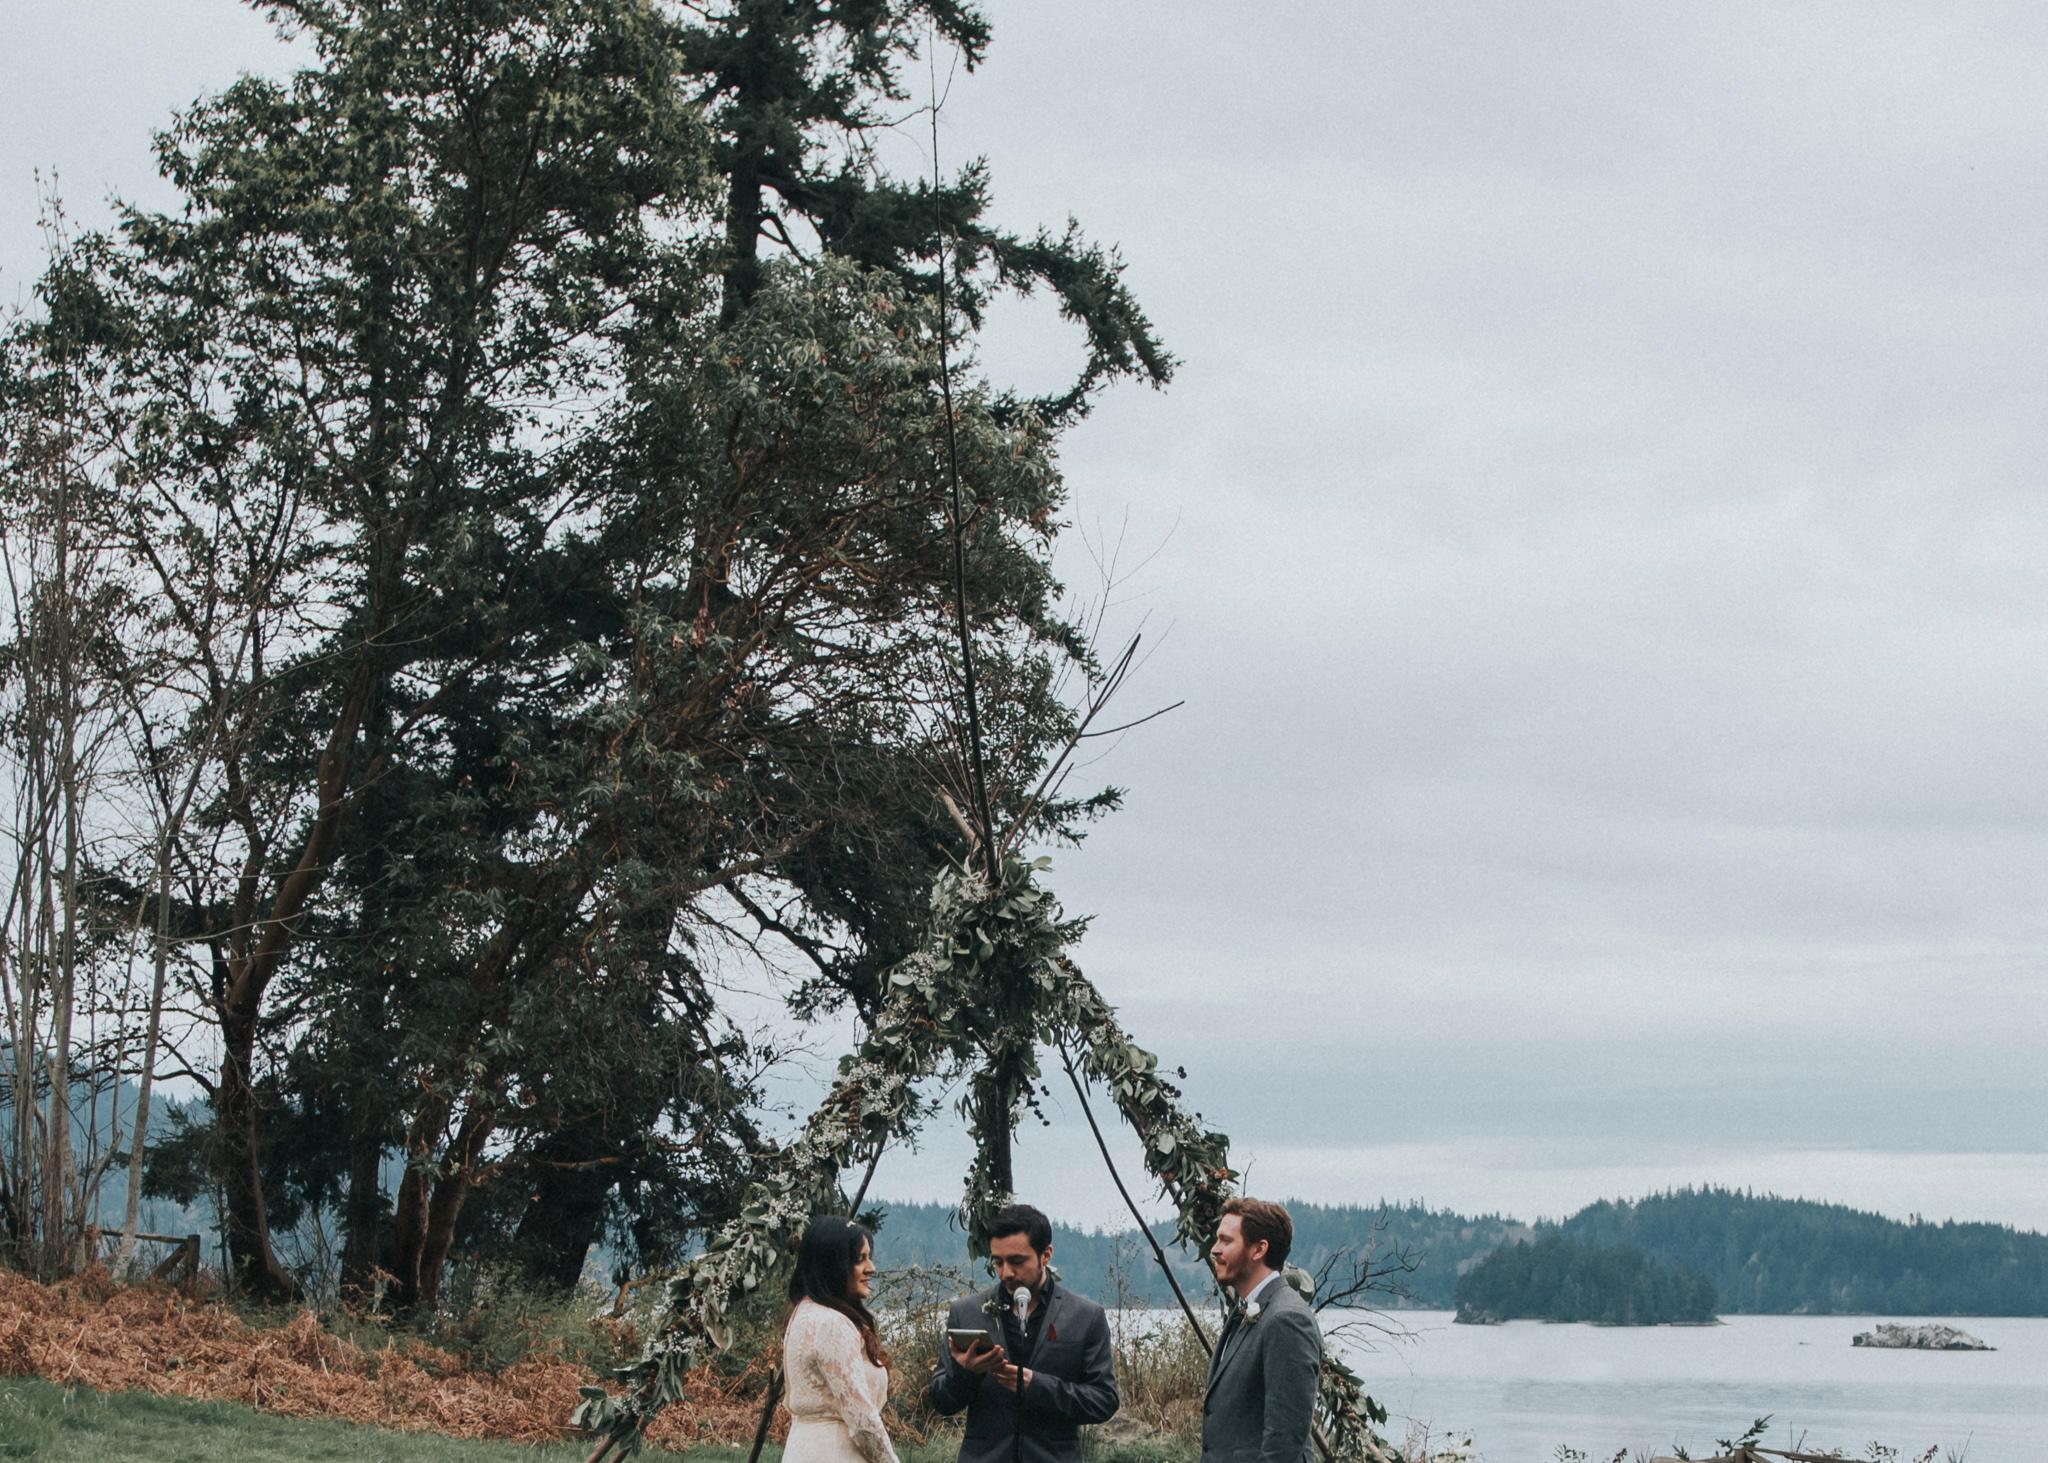 Bellingham wedding Woodstock Farms Vishal Goklani Seattle Wedding Photographer001-5.JPG